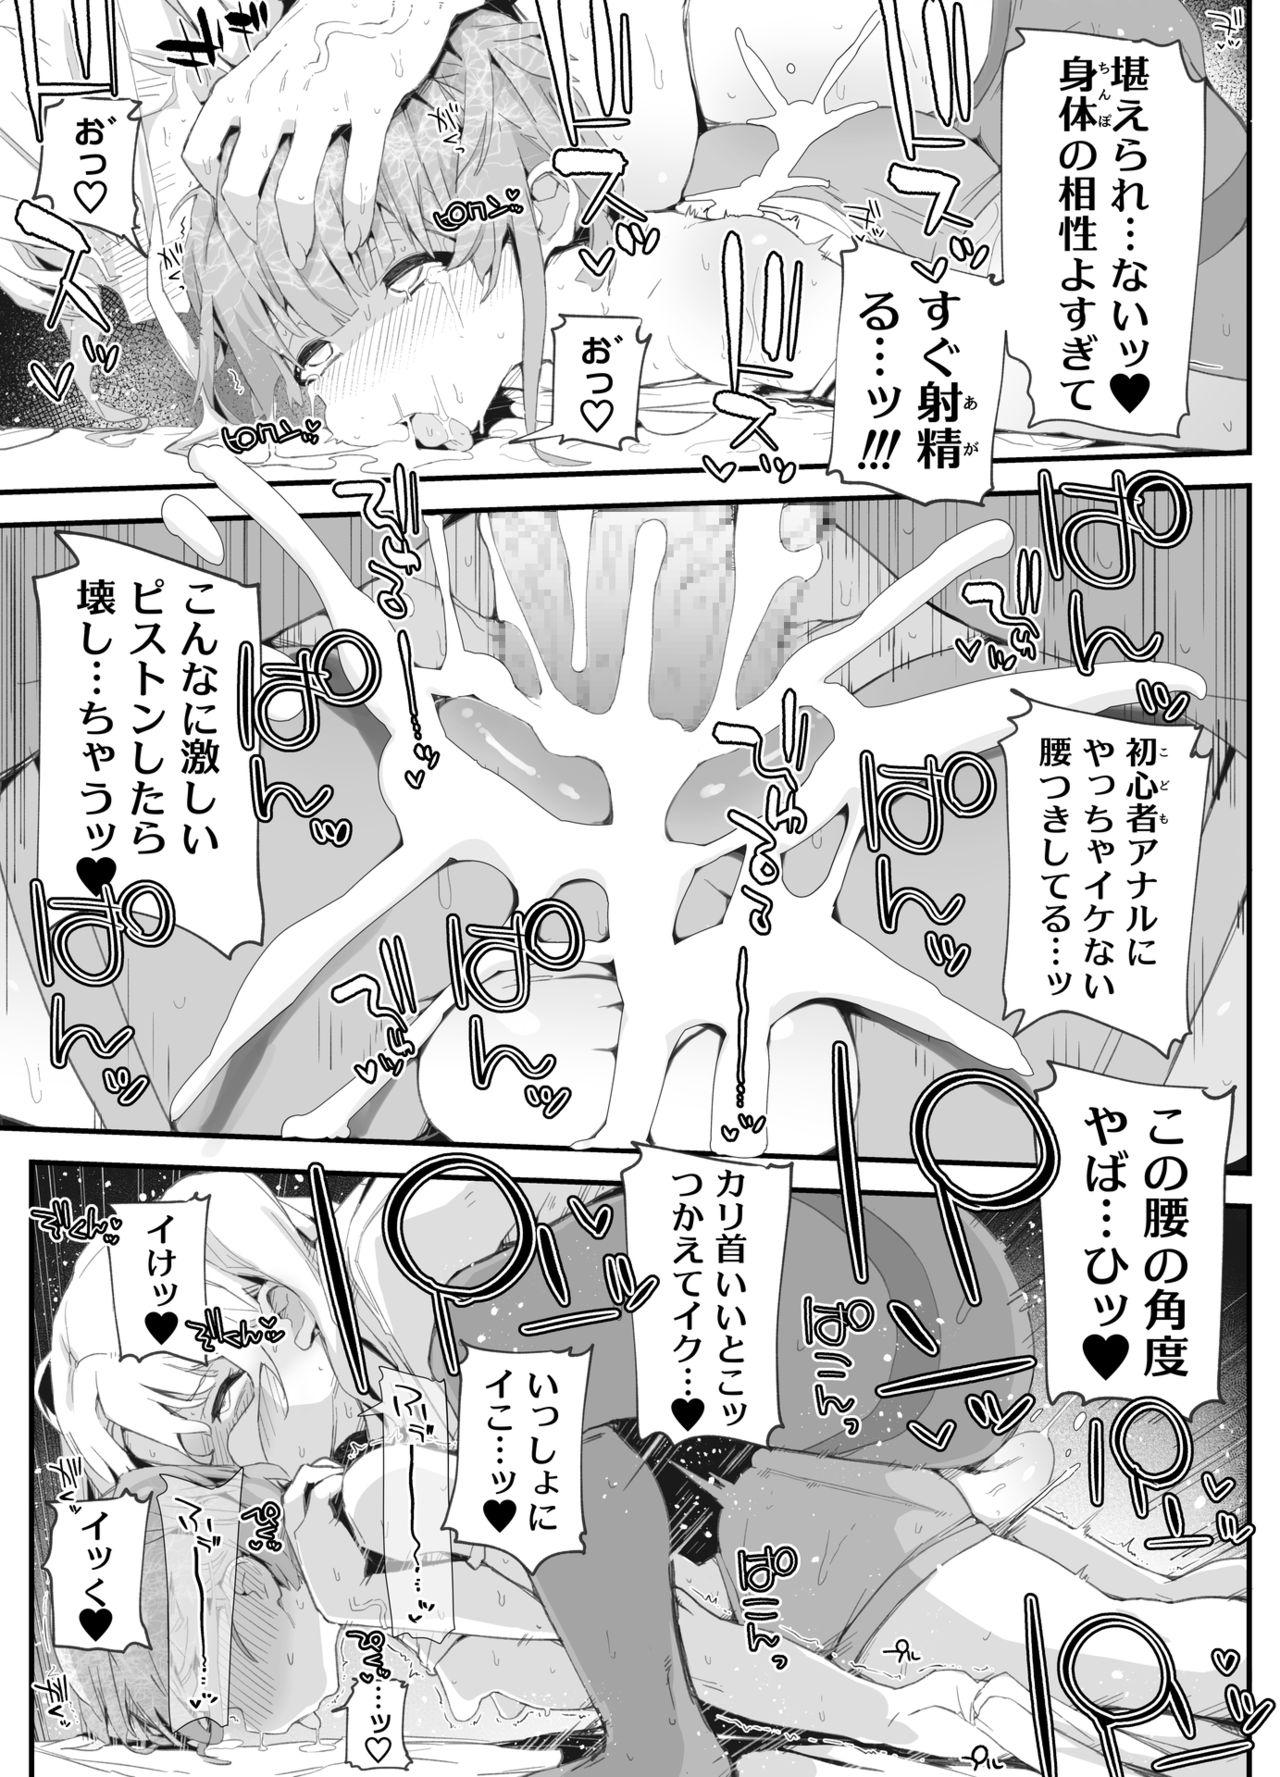 Futanari Onee-san ni Wakarasareta Otokonoko 25